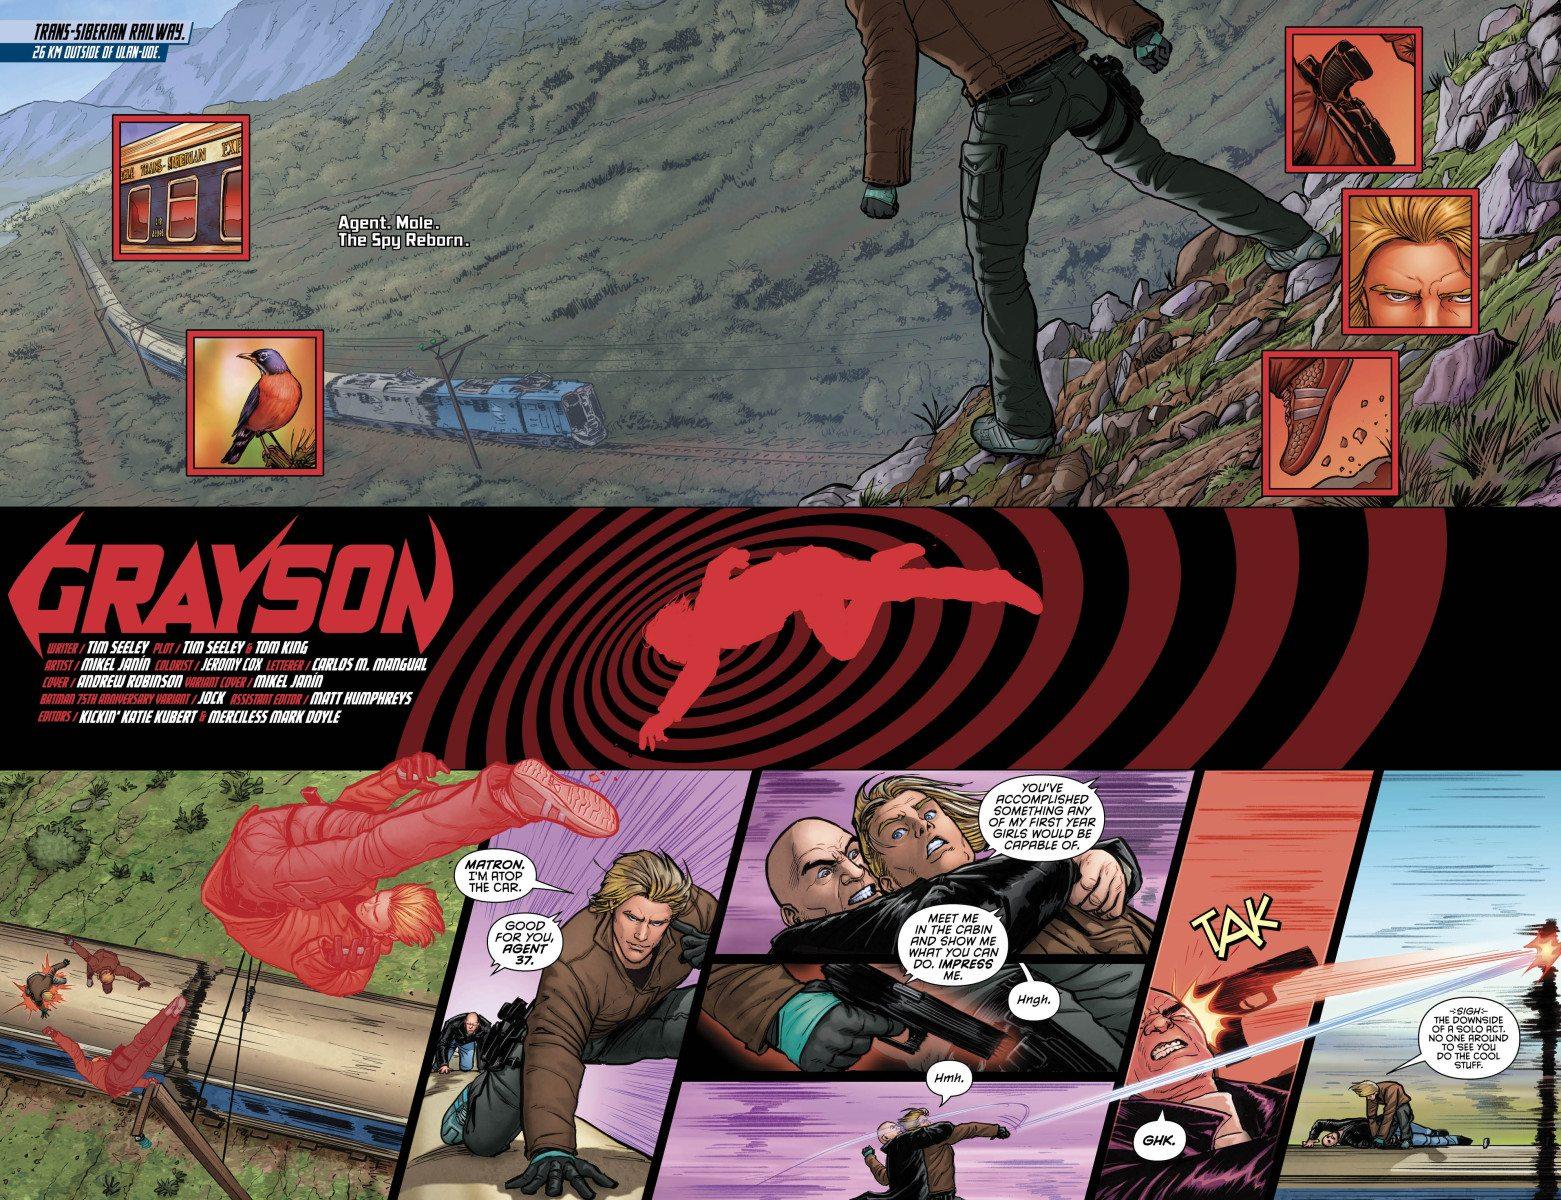 Grayson, Vol. 1, Pages 2 & 3, Courtesy of DC Comics